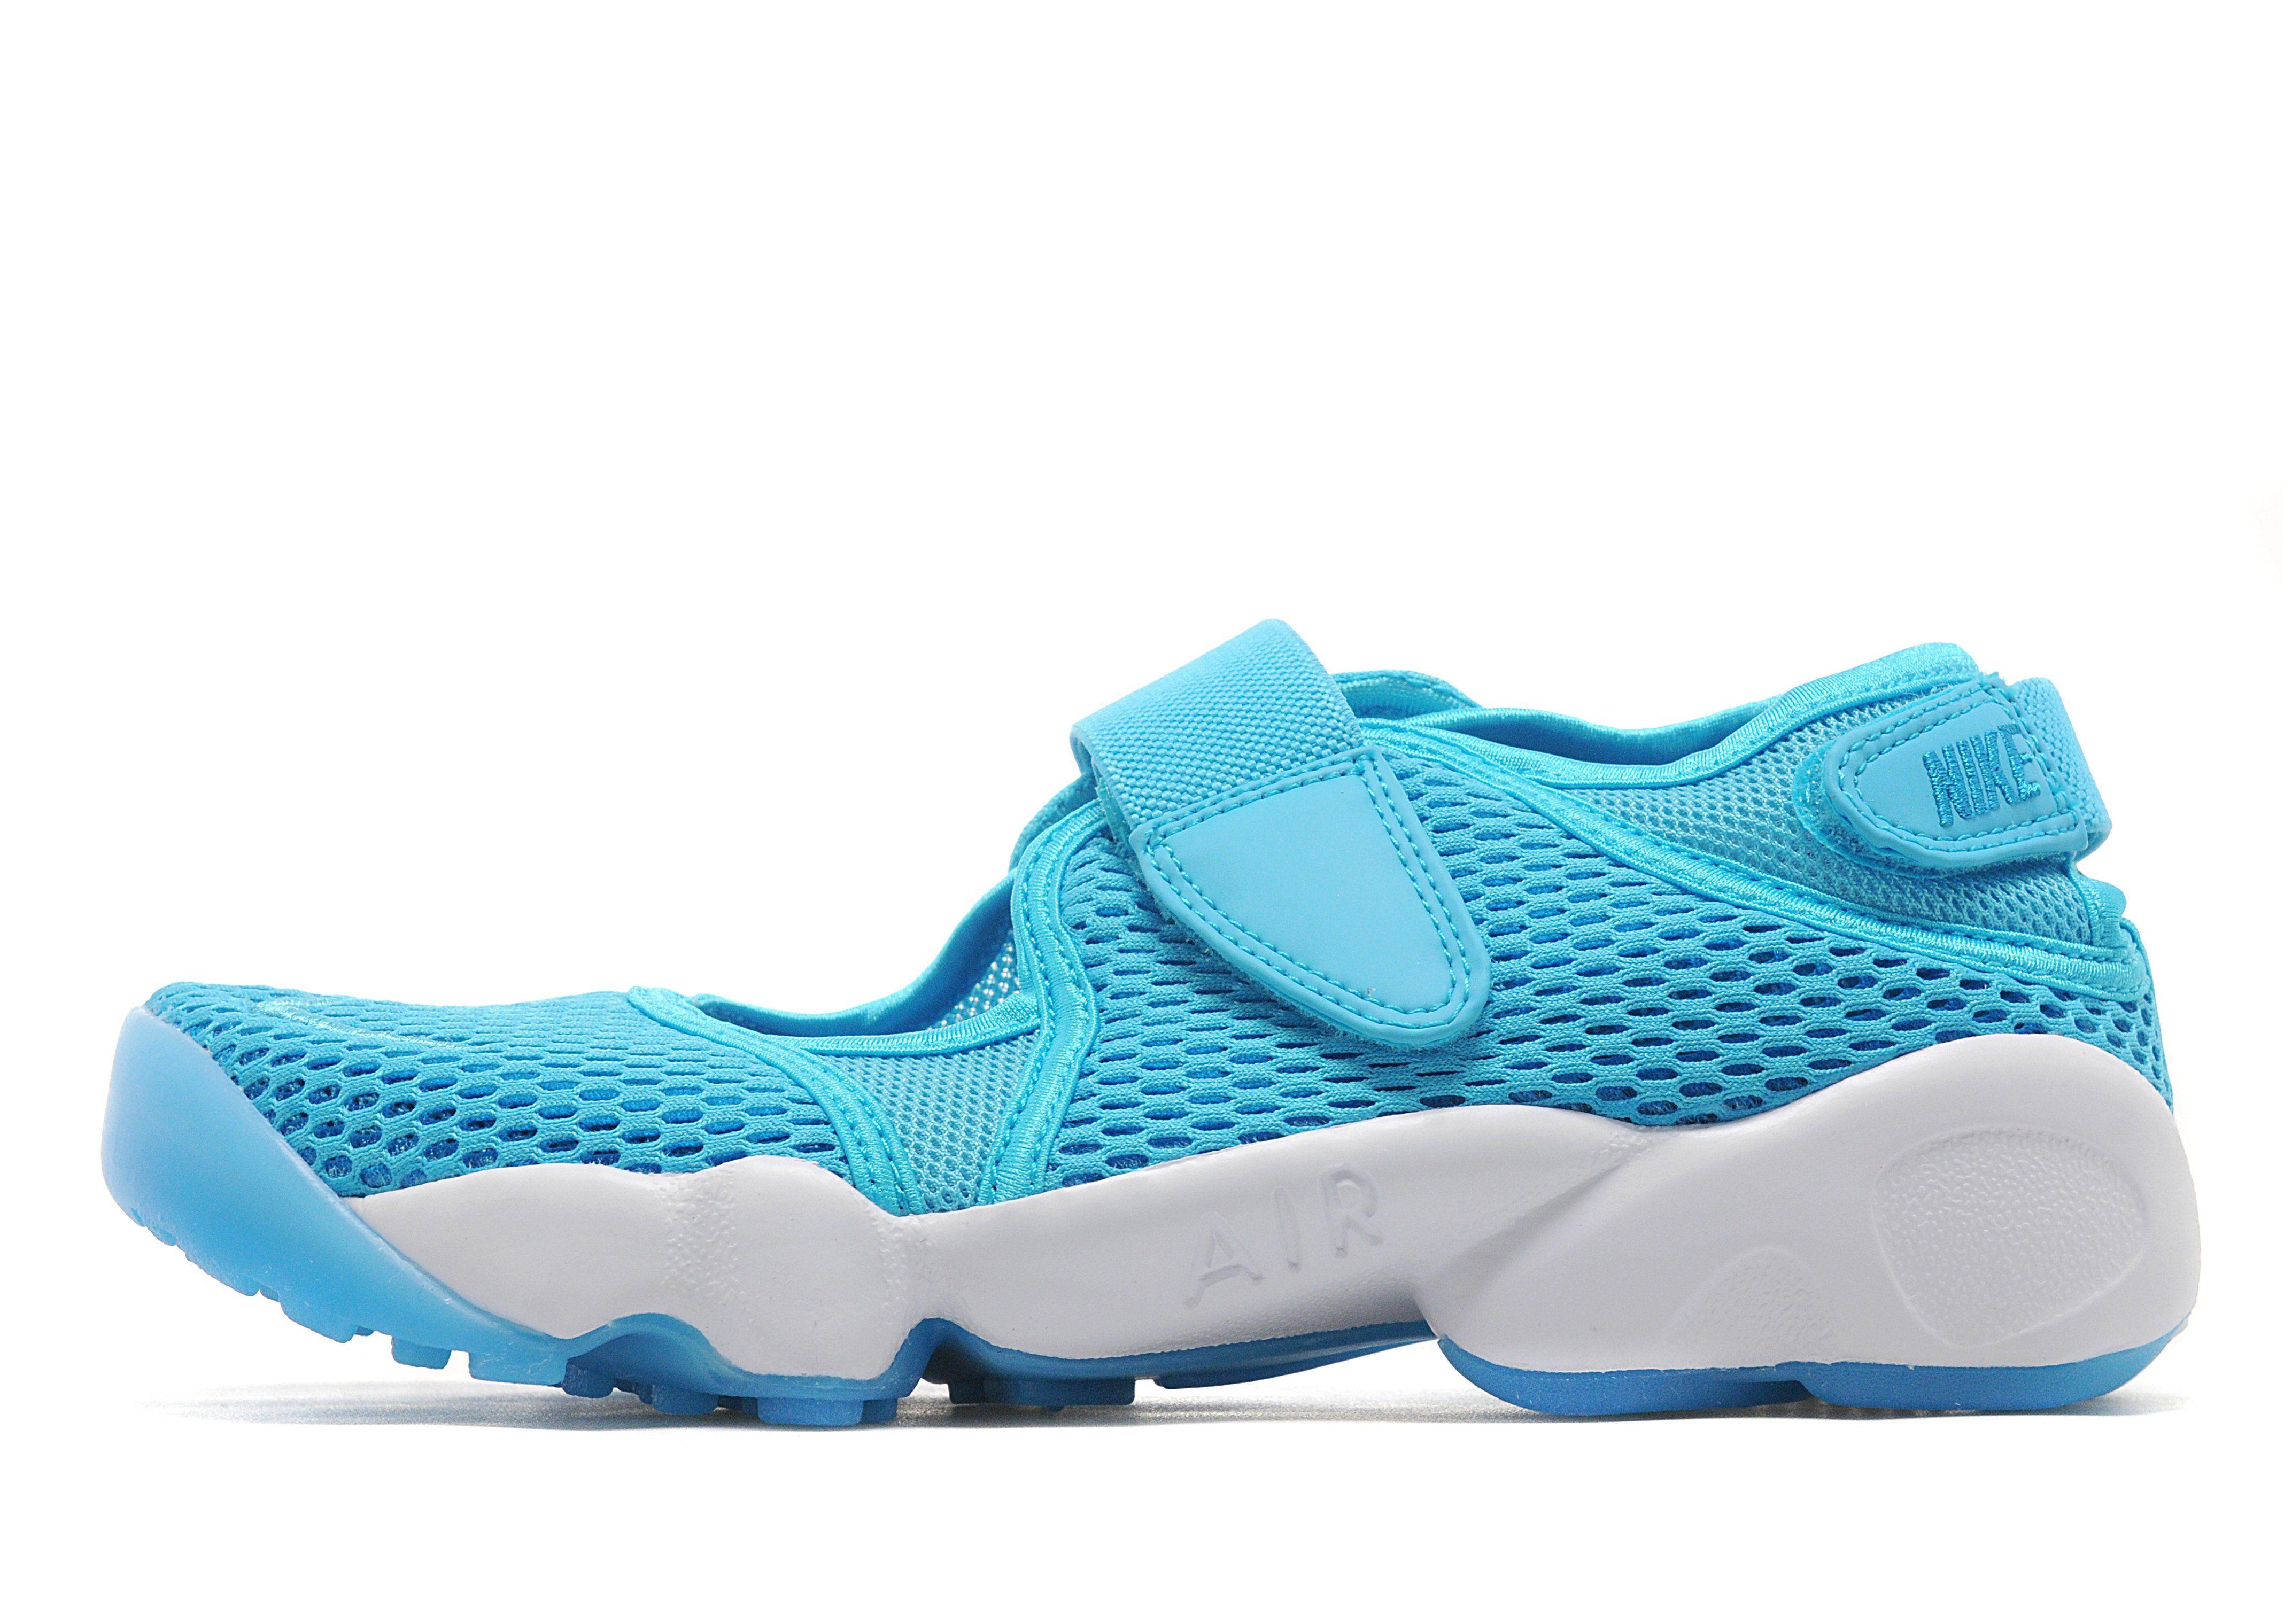 Nike Air Rift  Breathe  Collection Women s  9d5c4e0be5